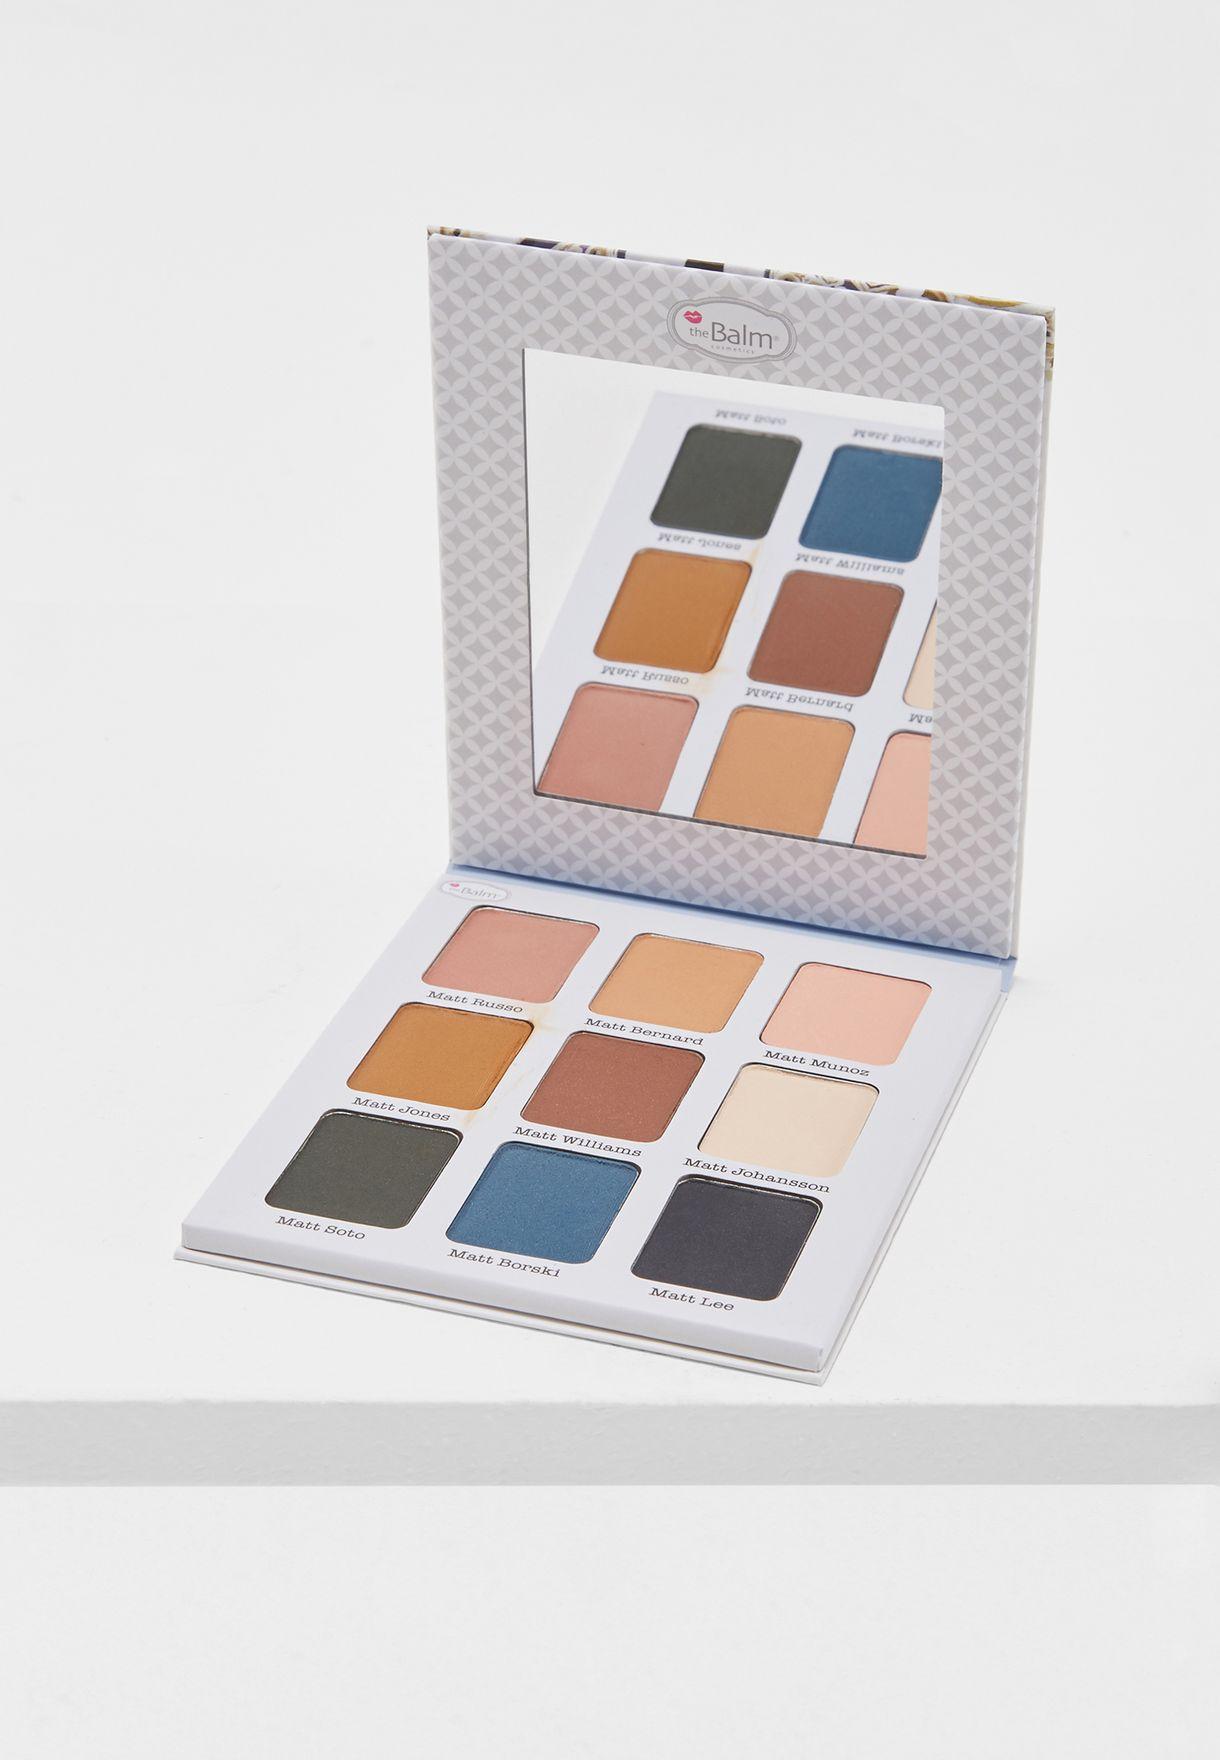 Meet Matte Adore Eyeshadow Palette